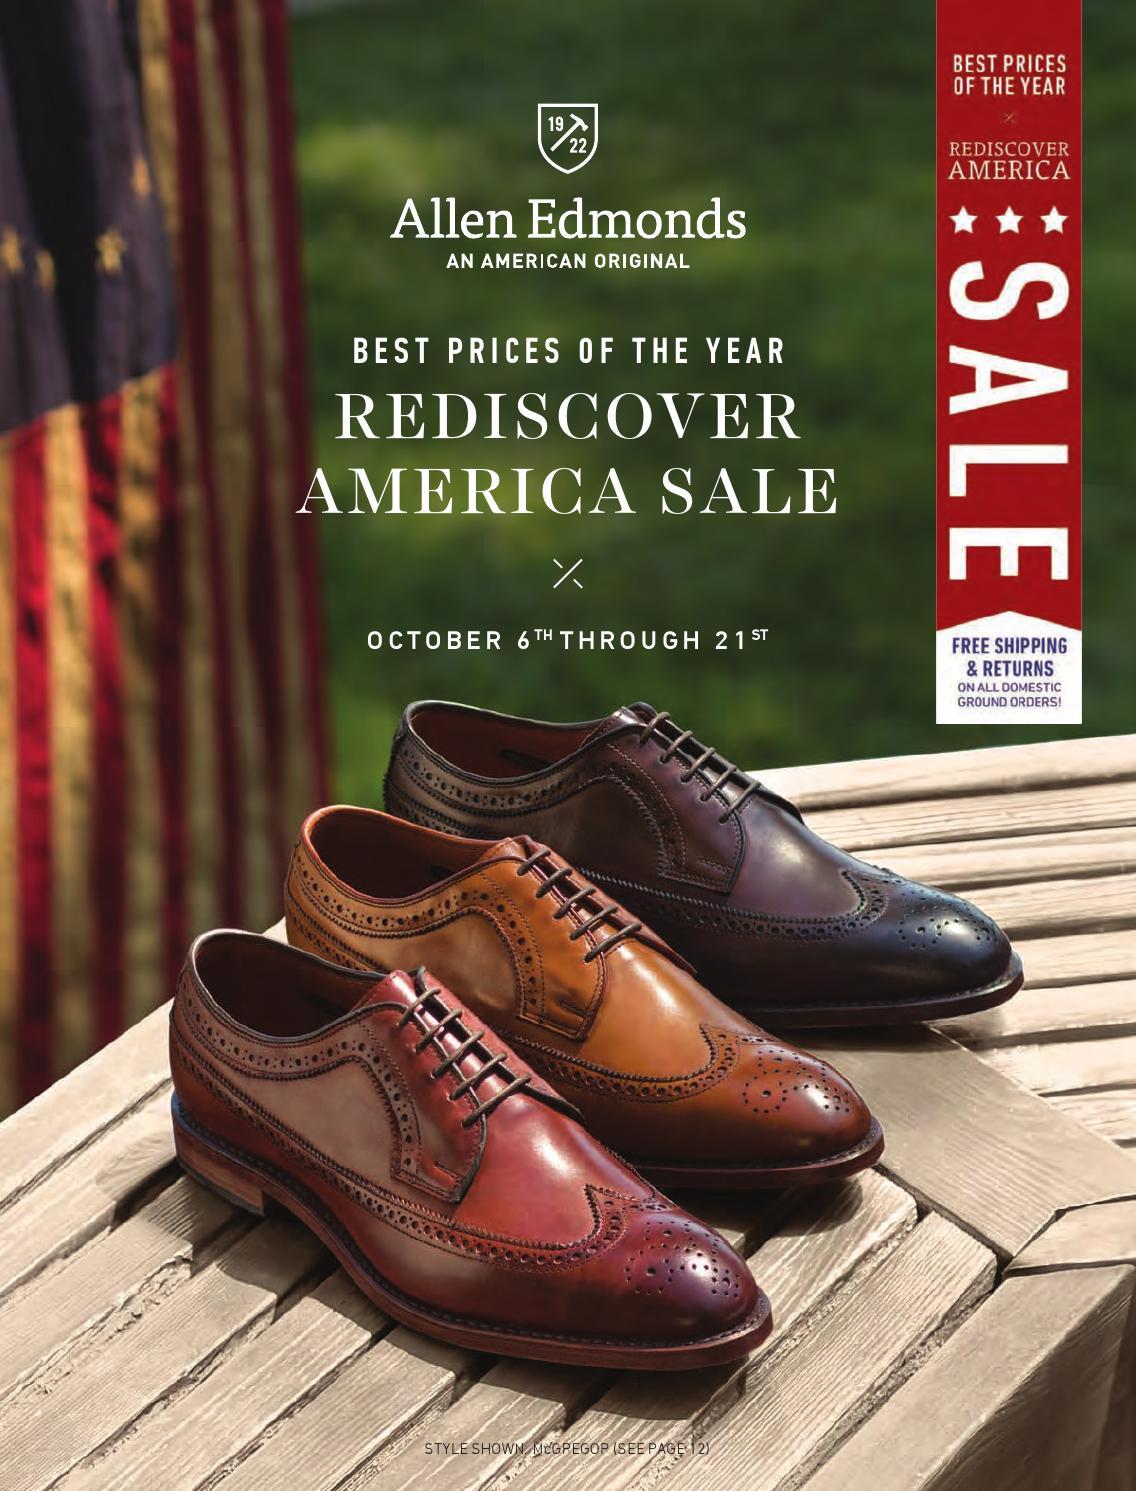 Allen Edmonds 2014 Rediscover America Sale Catalog By Allen Edmonds